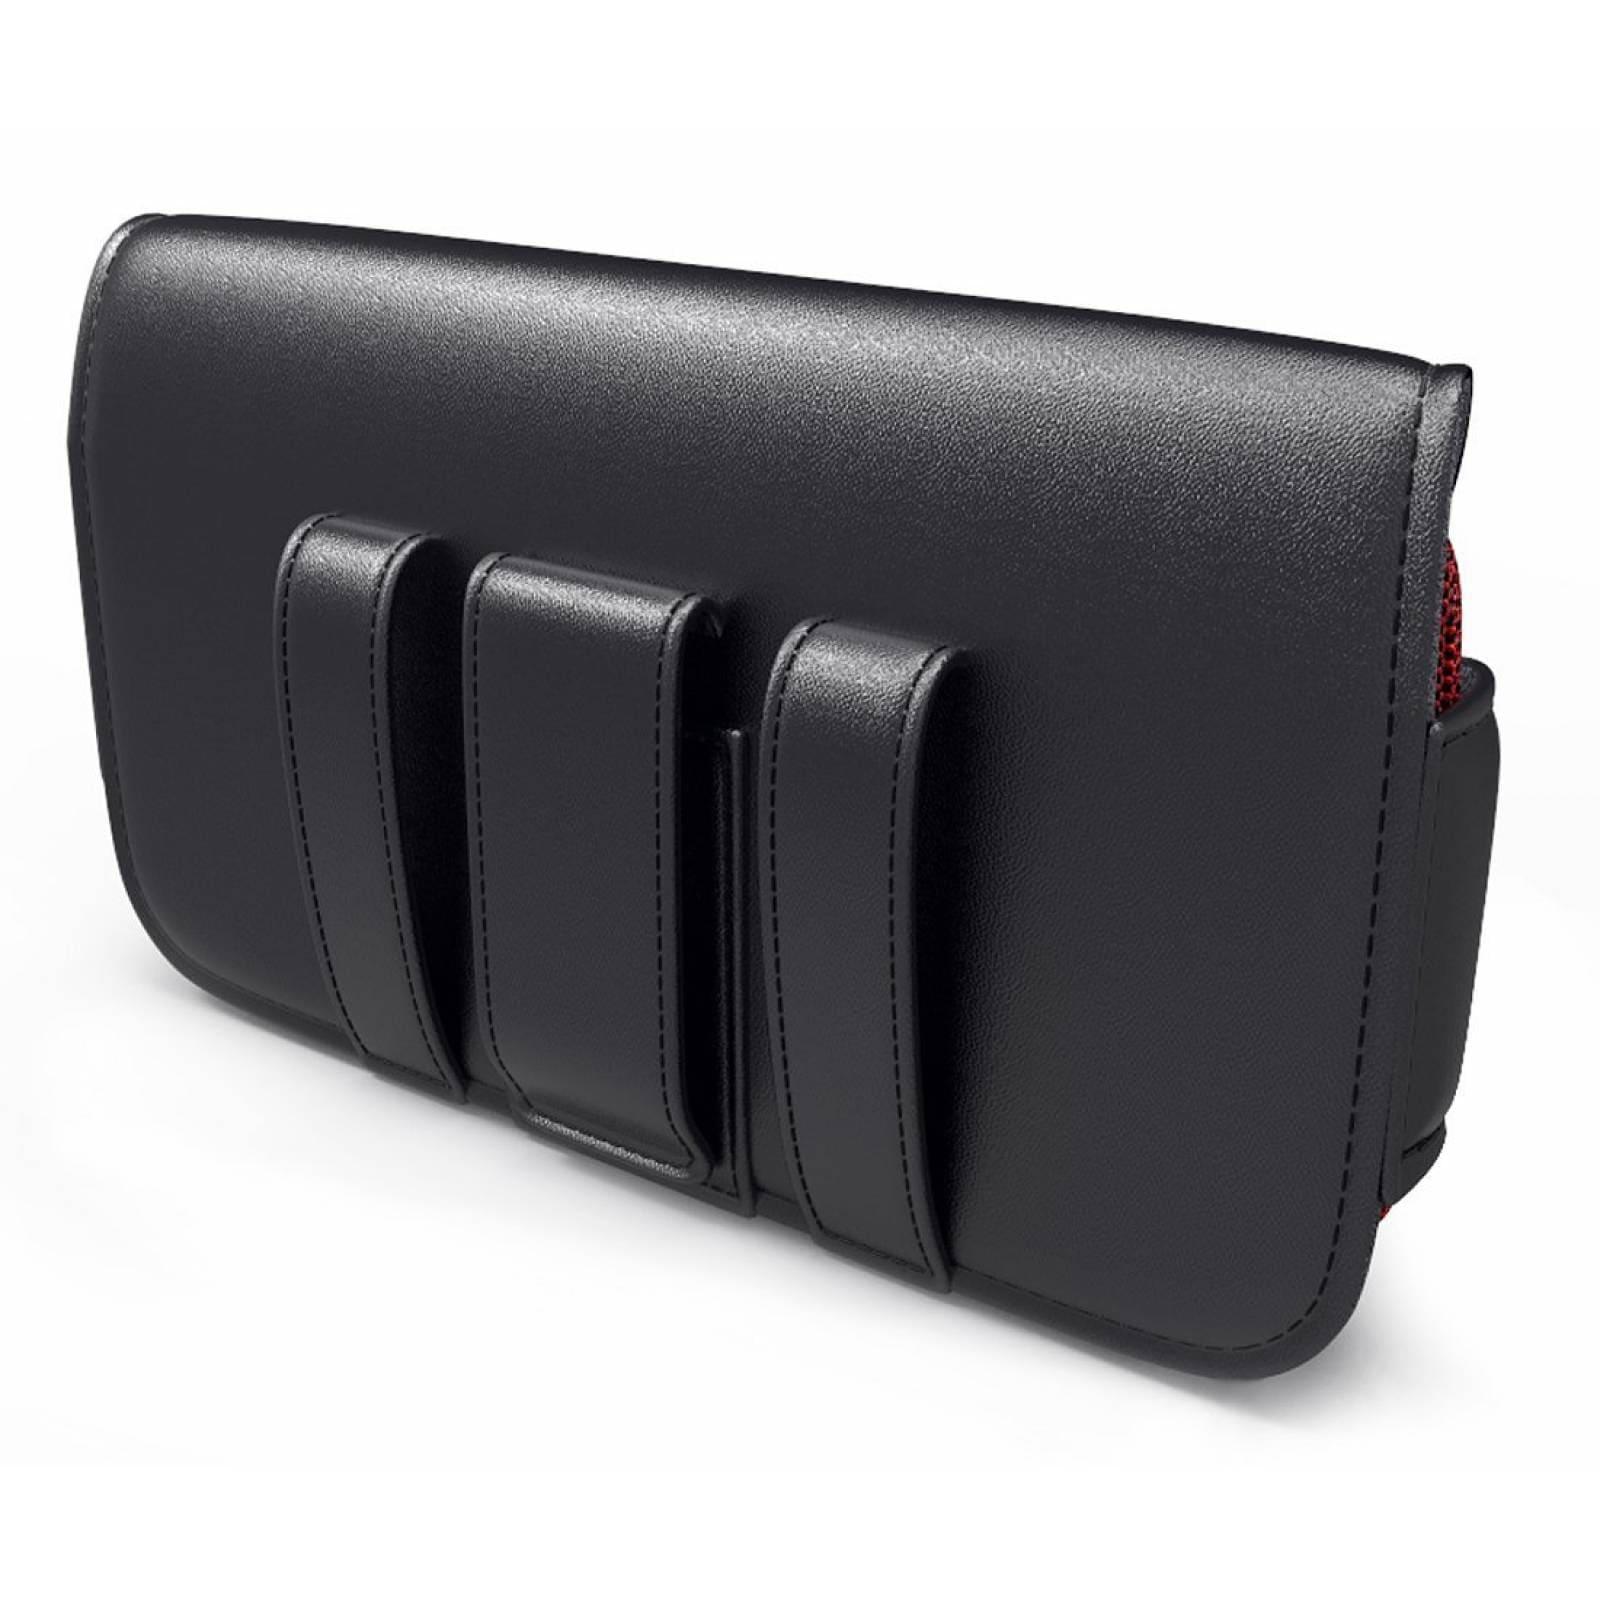 702078da24b Funda lorem para iphone 6s/7/8 para cinturón uso rudo